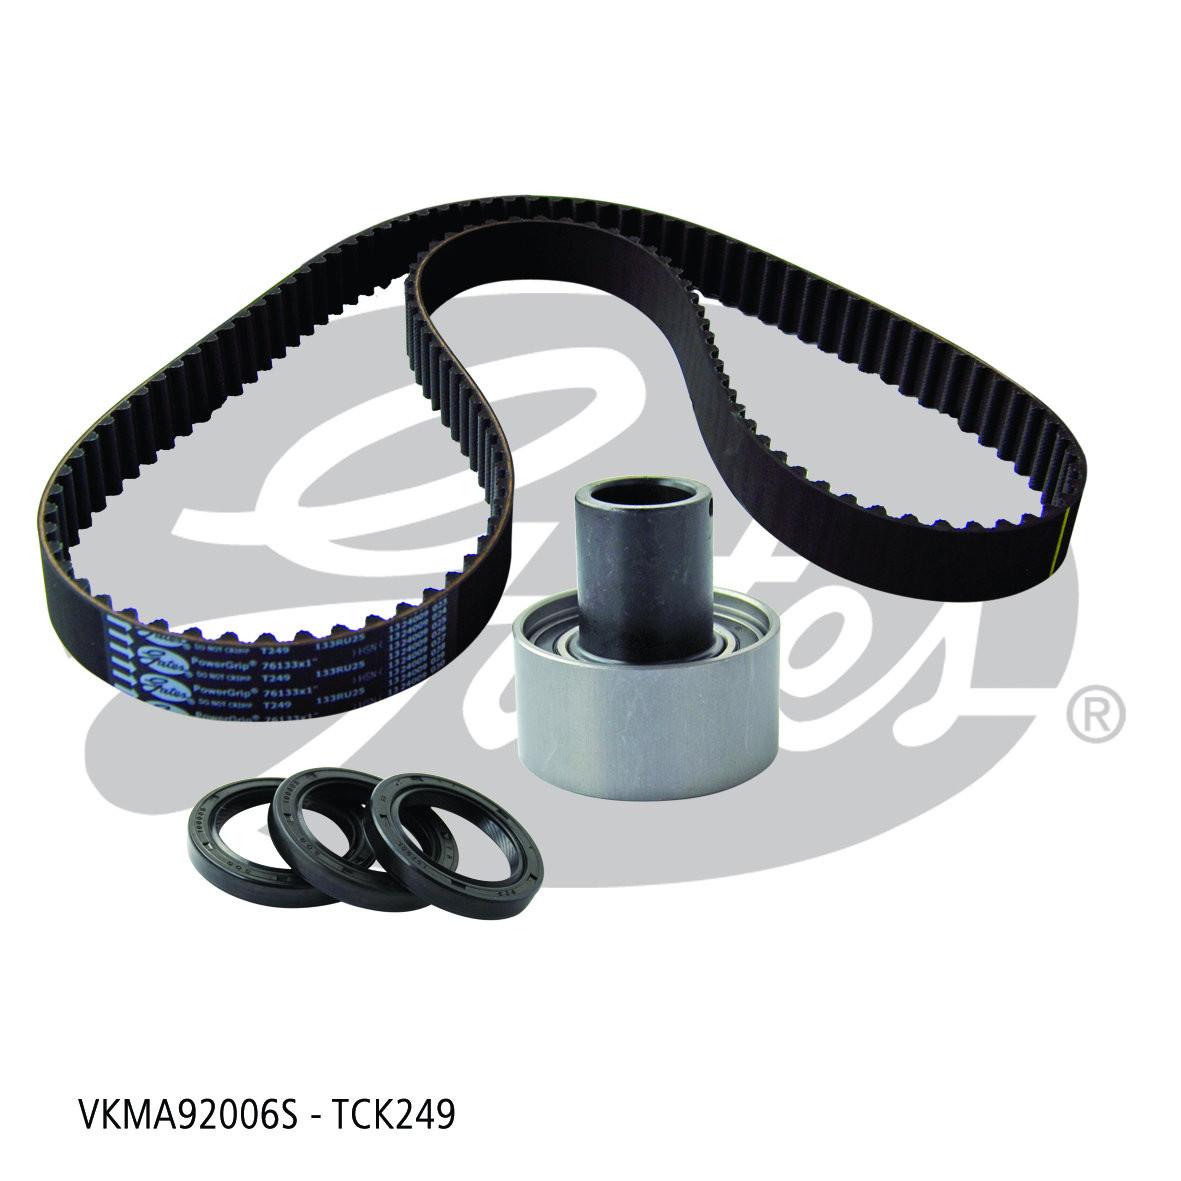 Gates TCK249 Timing Belt Component Kit